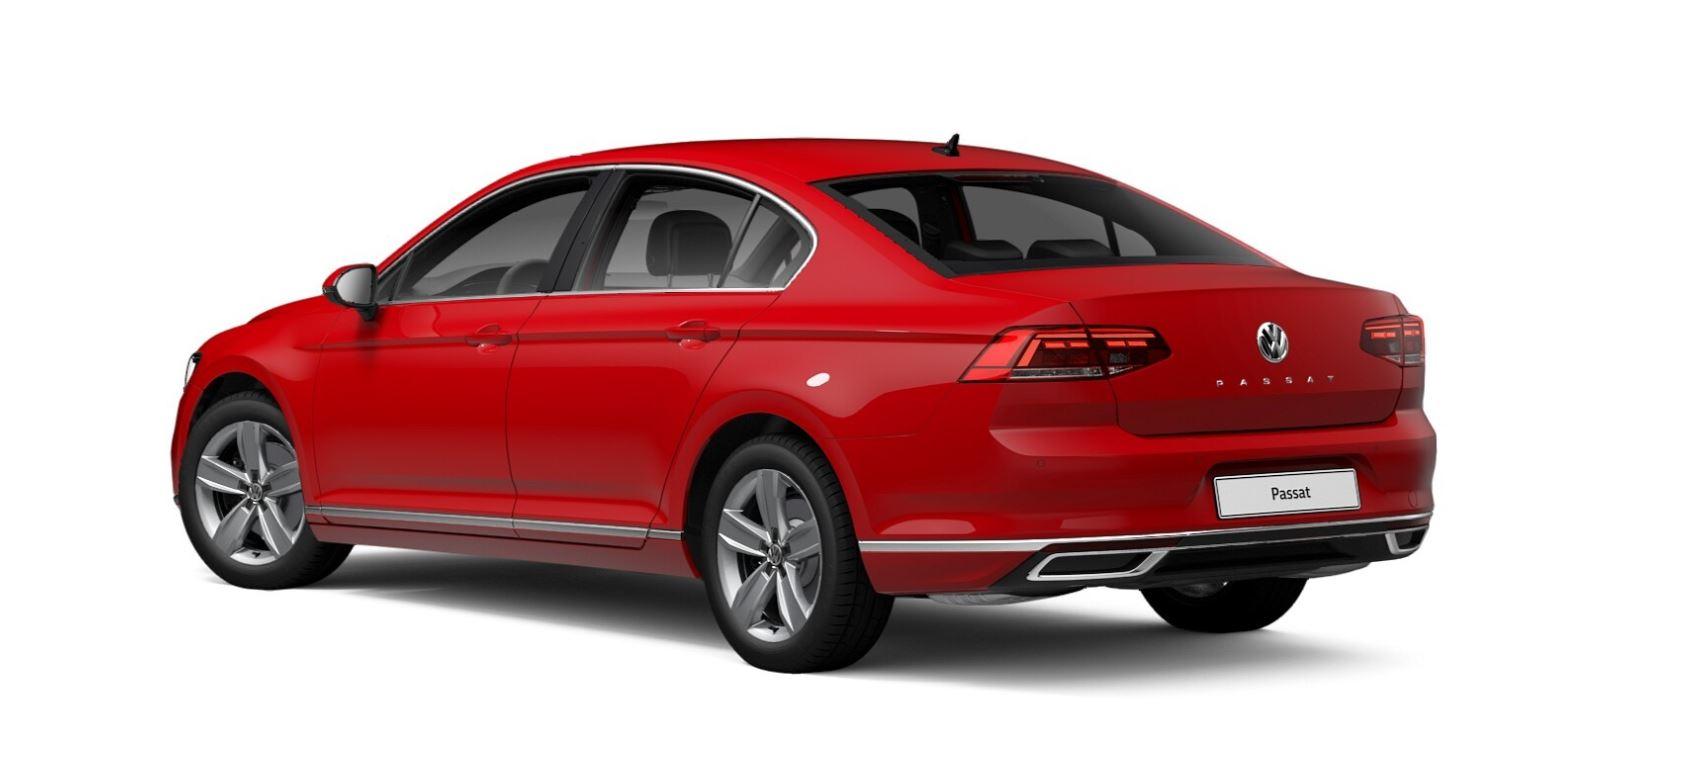 VW Passat lifting 2019